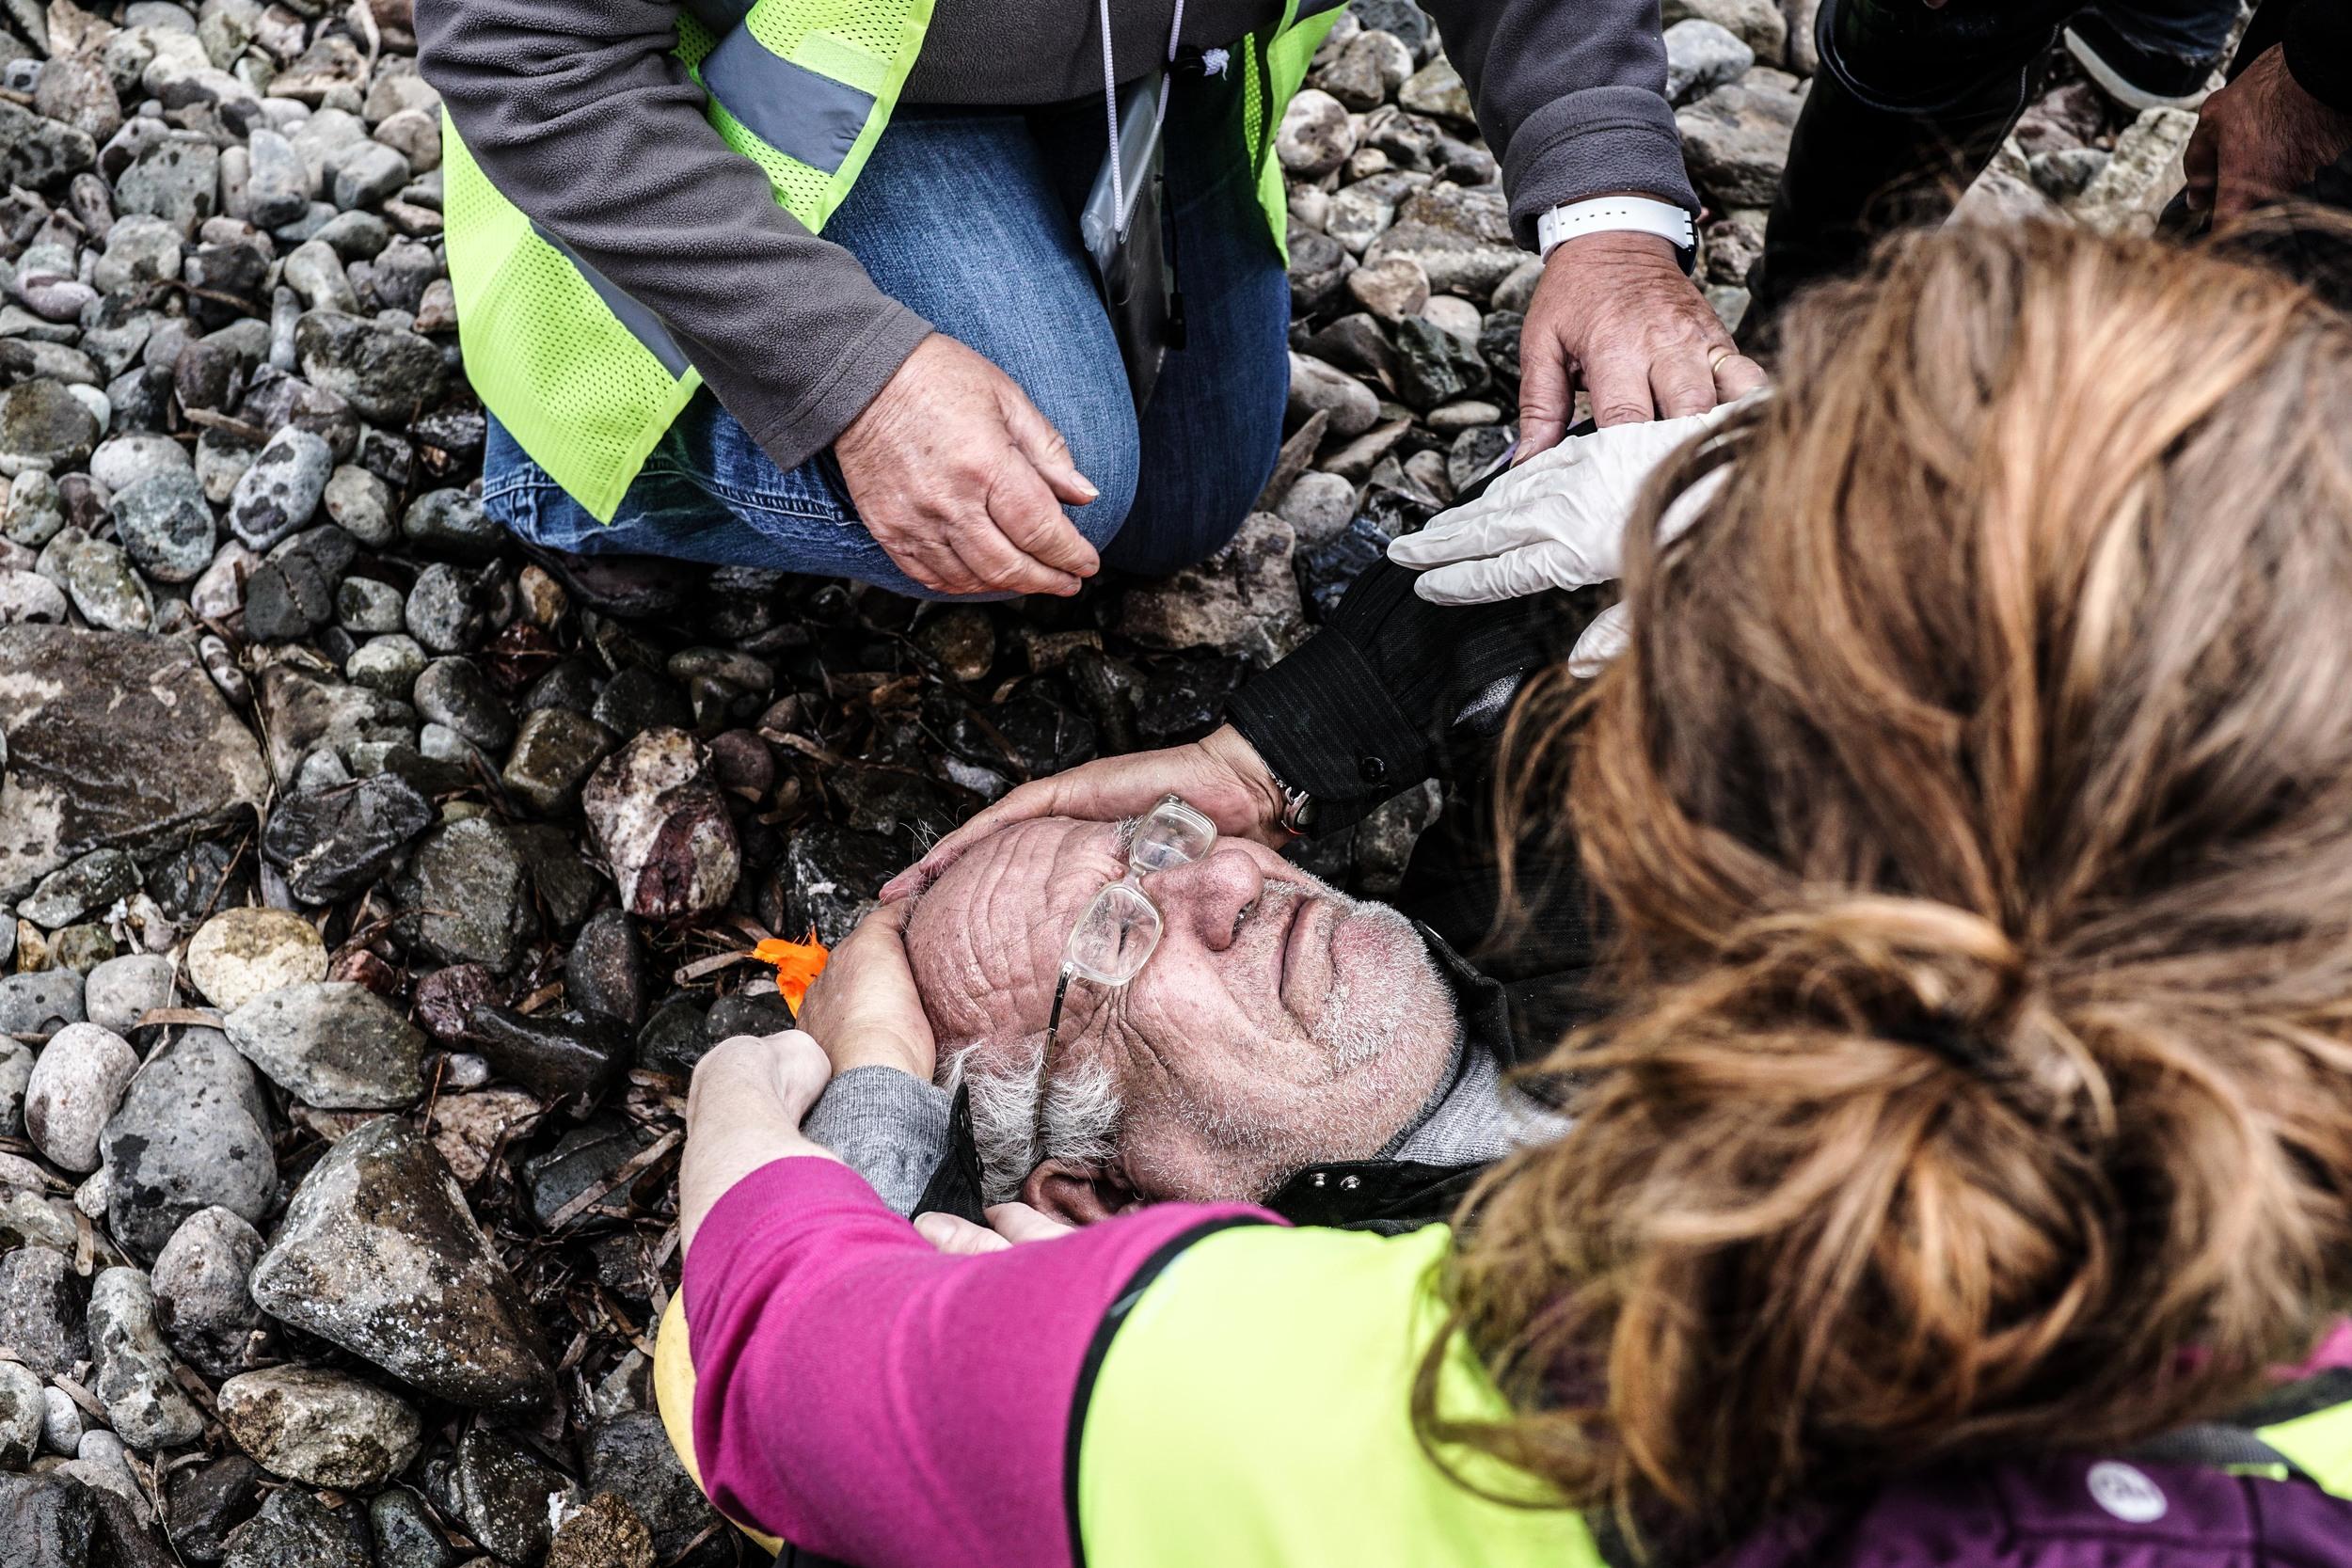 Syrian Refugee Crisis Lesbos Greece November 2015 10.jpg